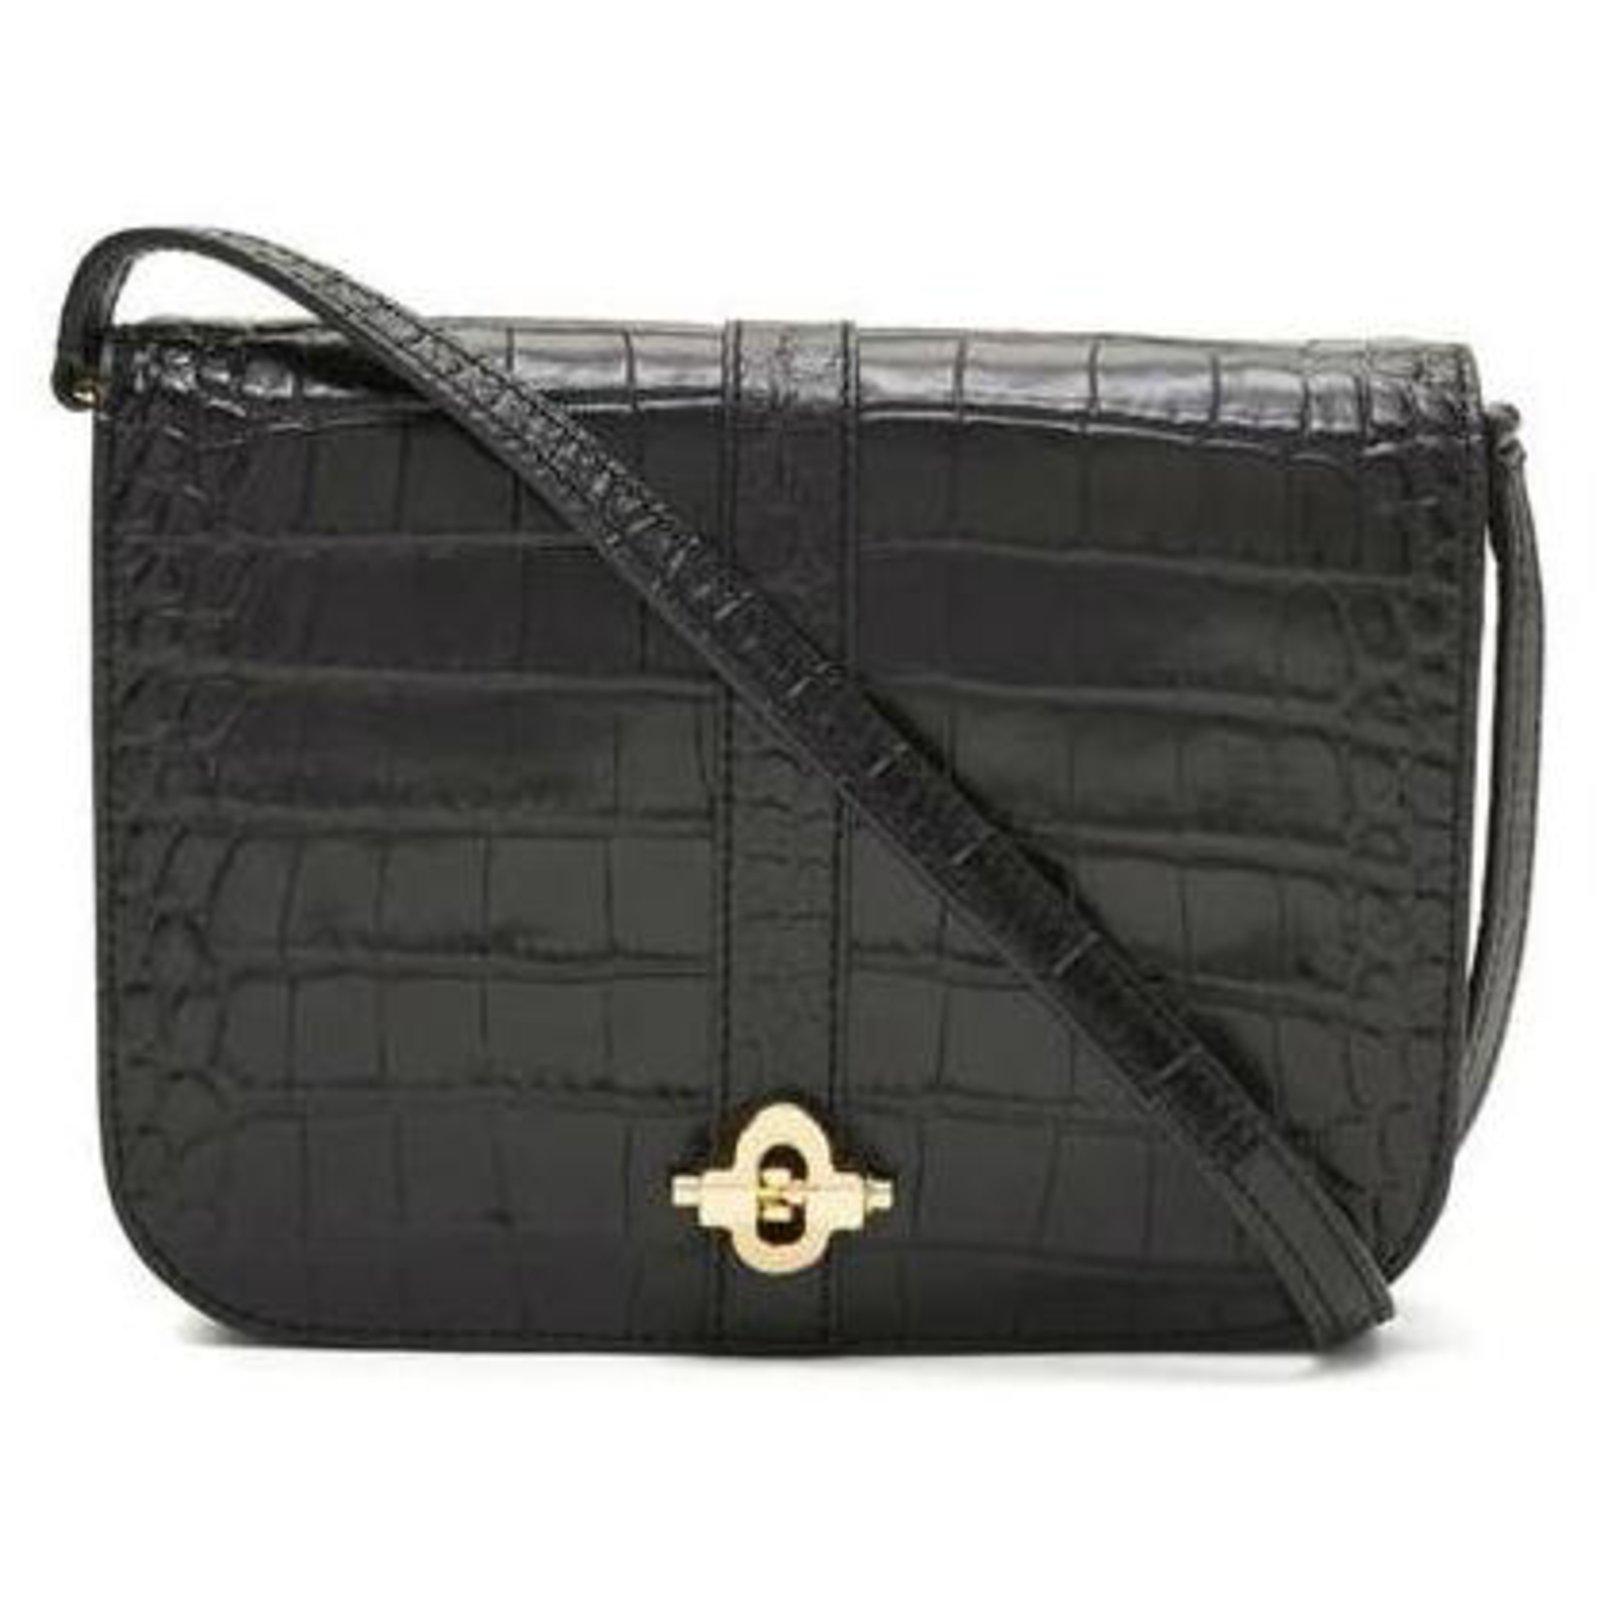 Banana Republic Black leather bag crocodile pattern banana republic  Handbags Patent leather Black ref.86054 25d69035d8907